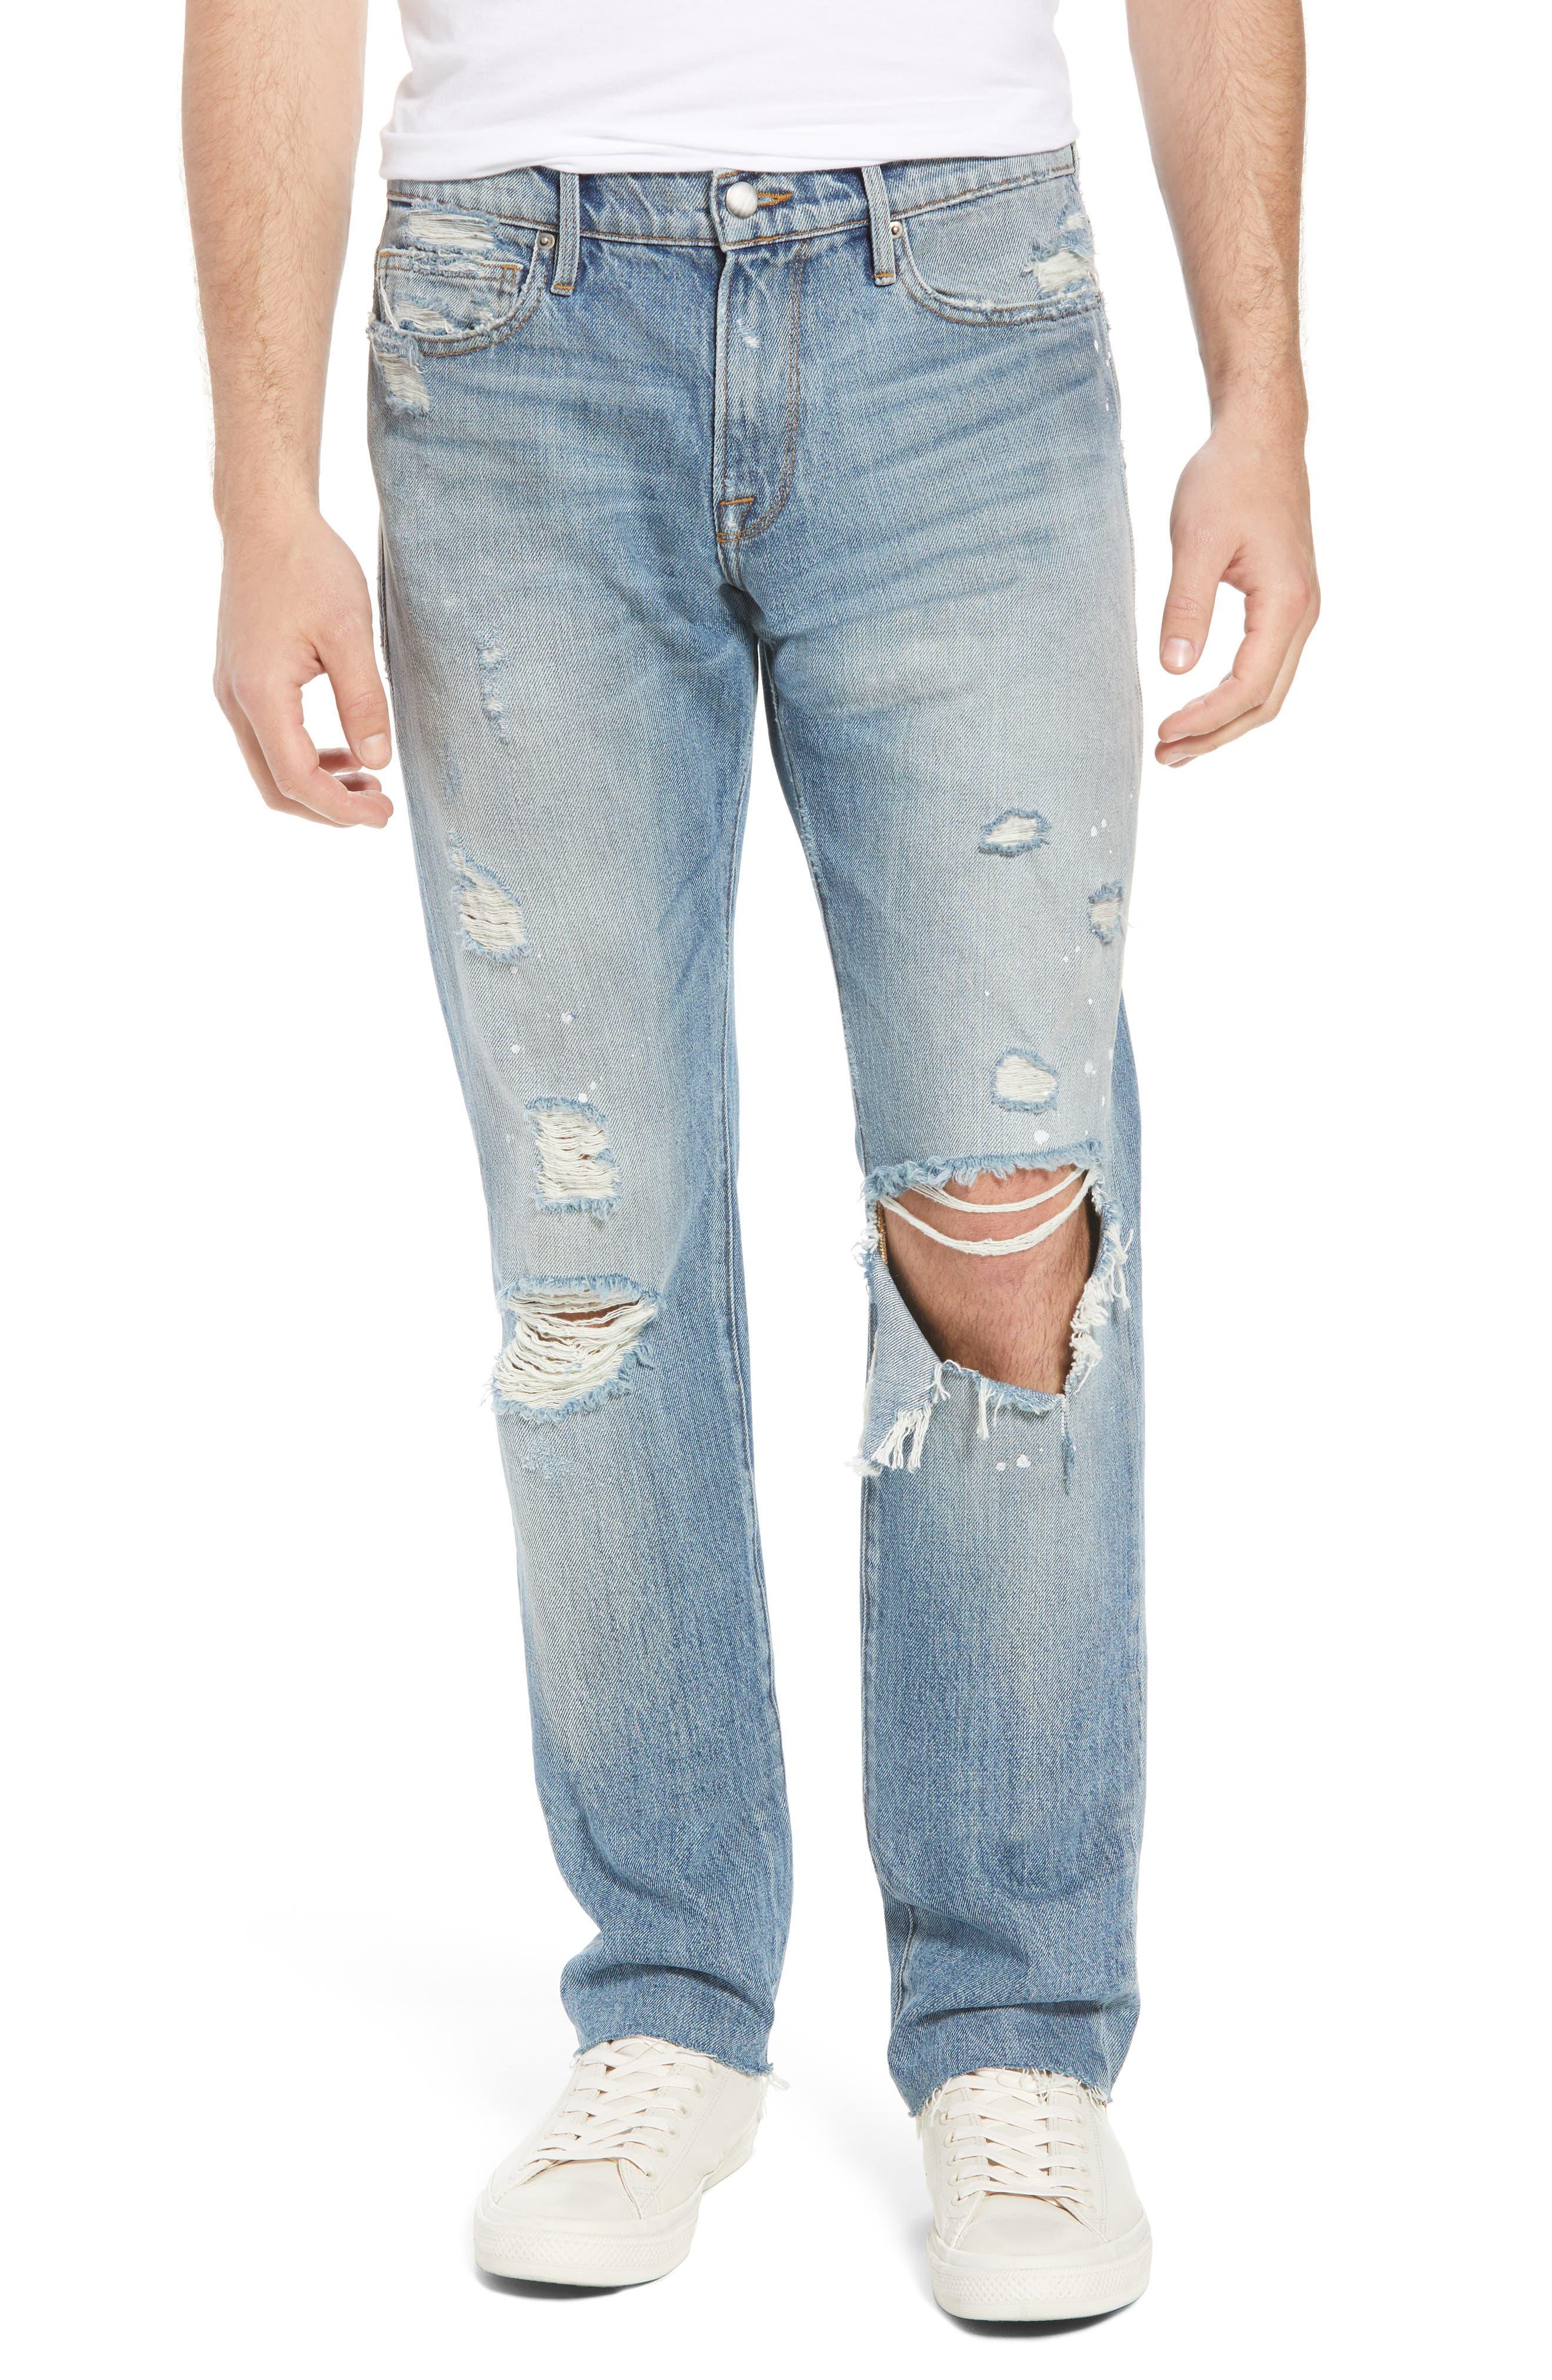 L'Homme Slim Fit Jeans,                         Main,                         color, Bizworth